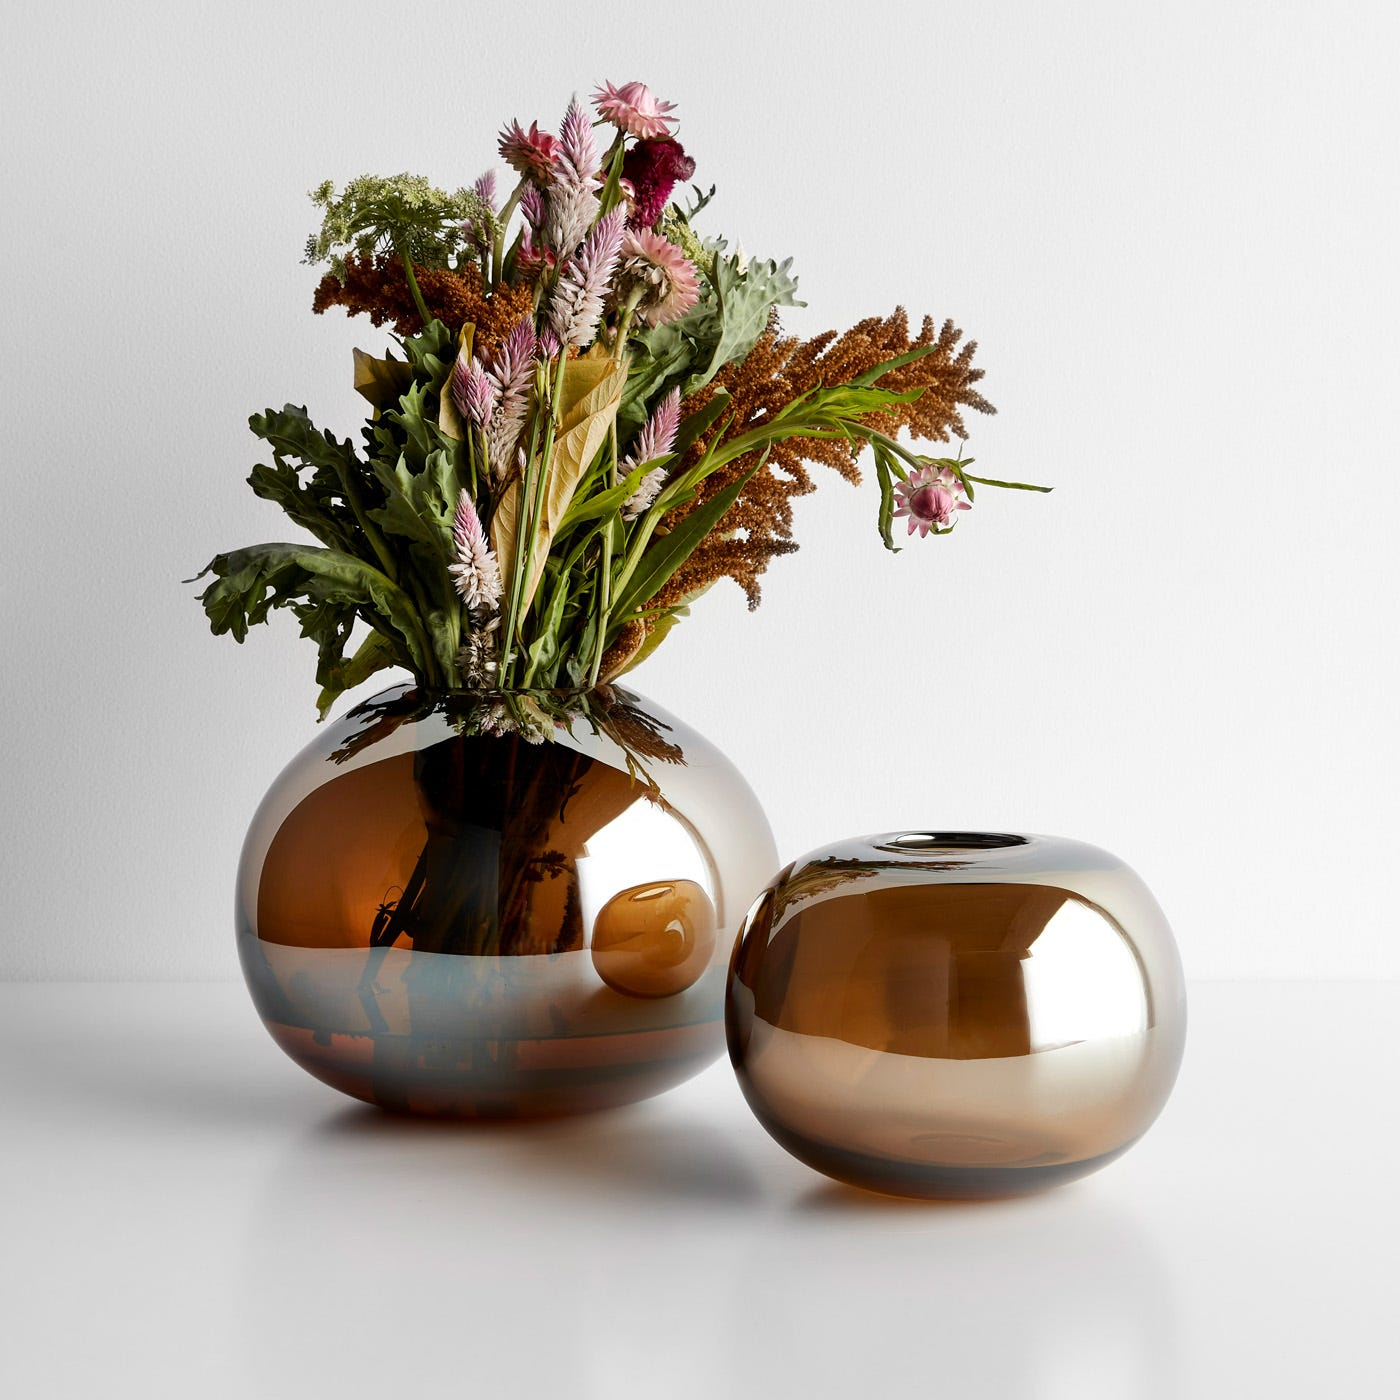 LSA International Epoque Amber Vases